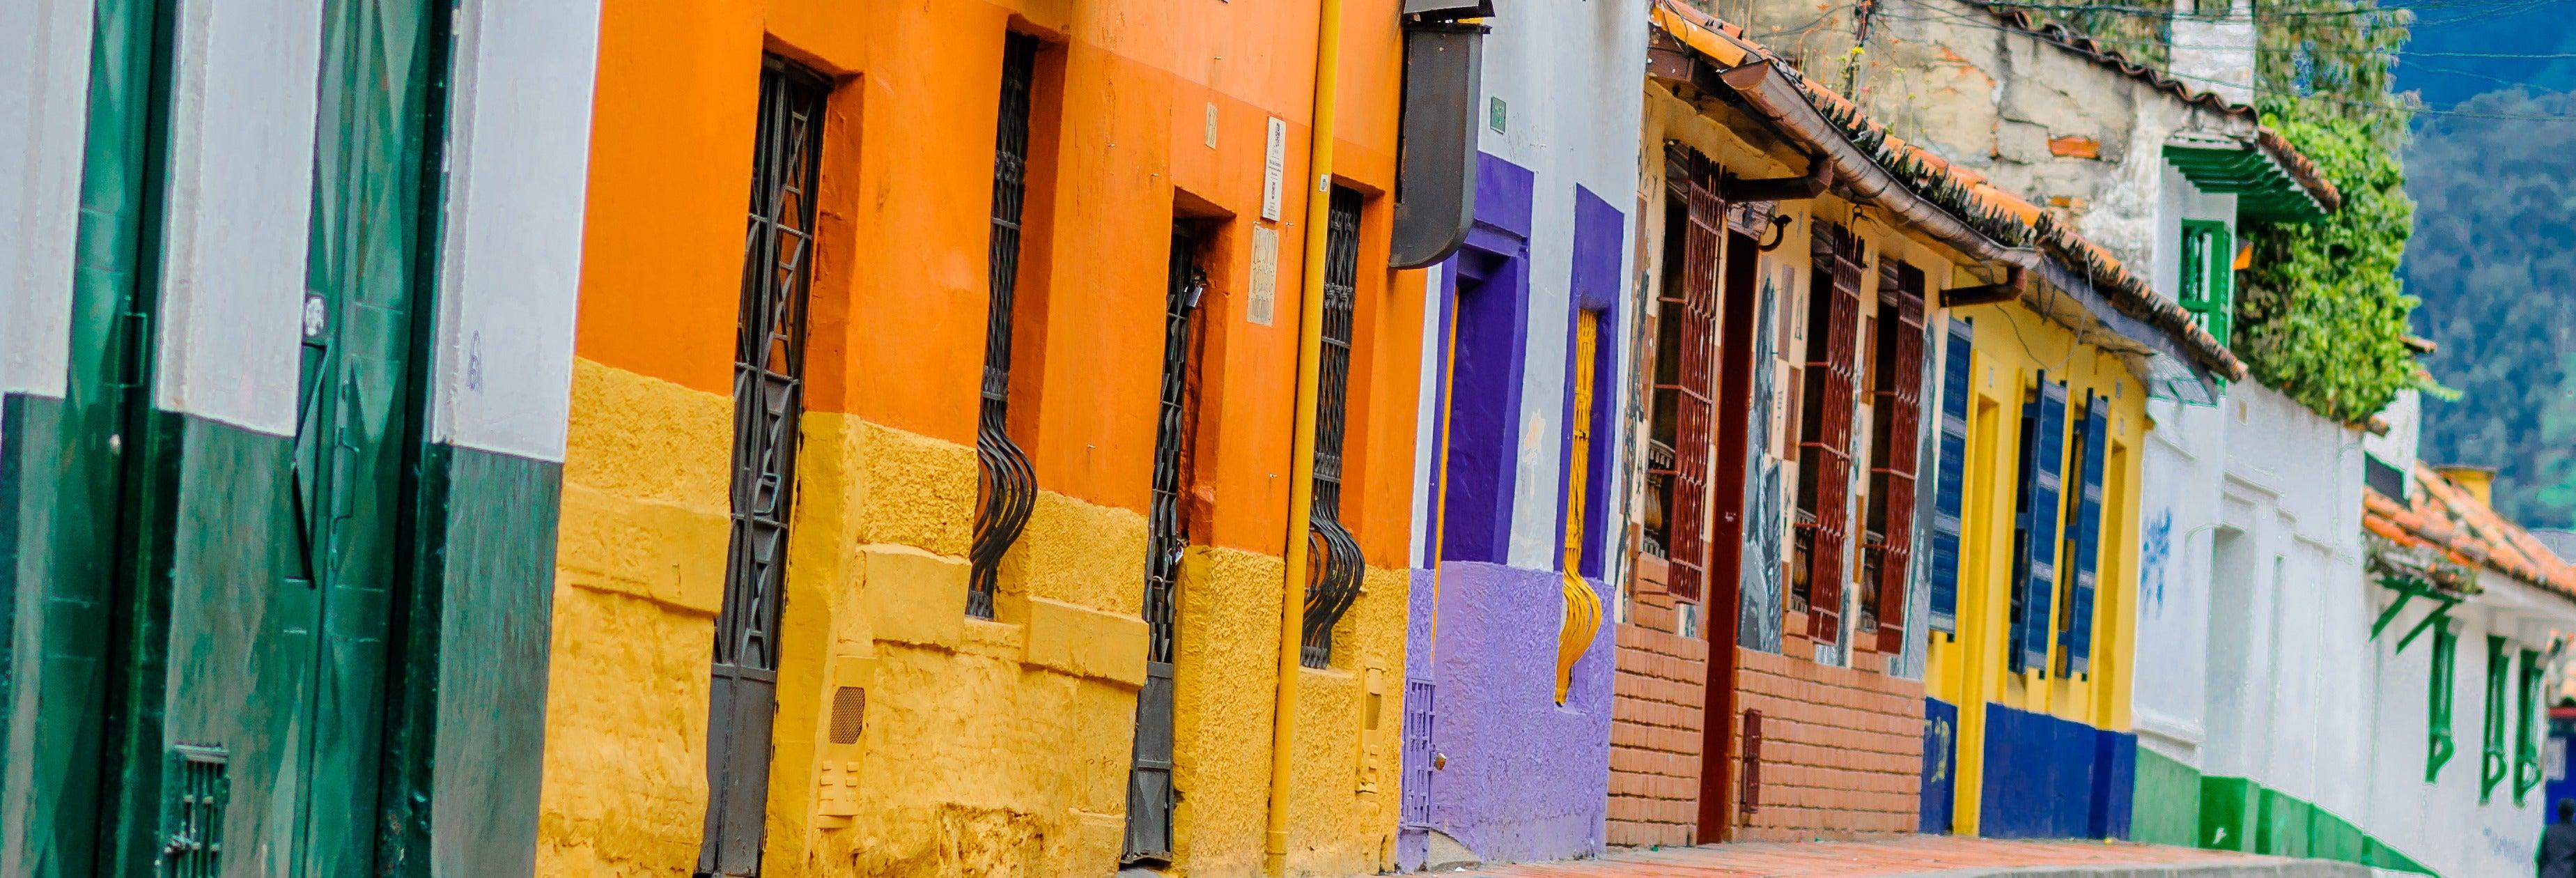 Free tour de contrastes de Bogotá